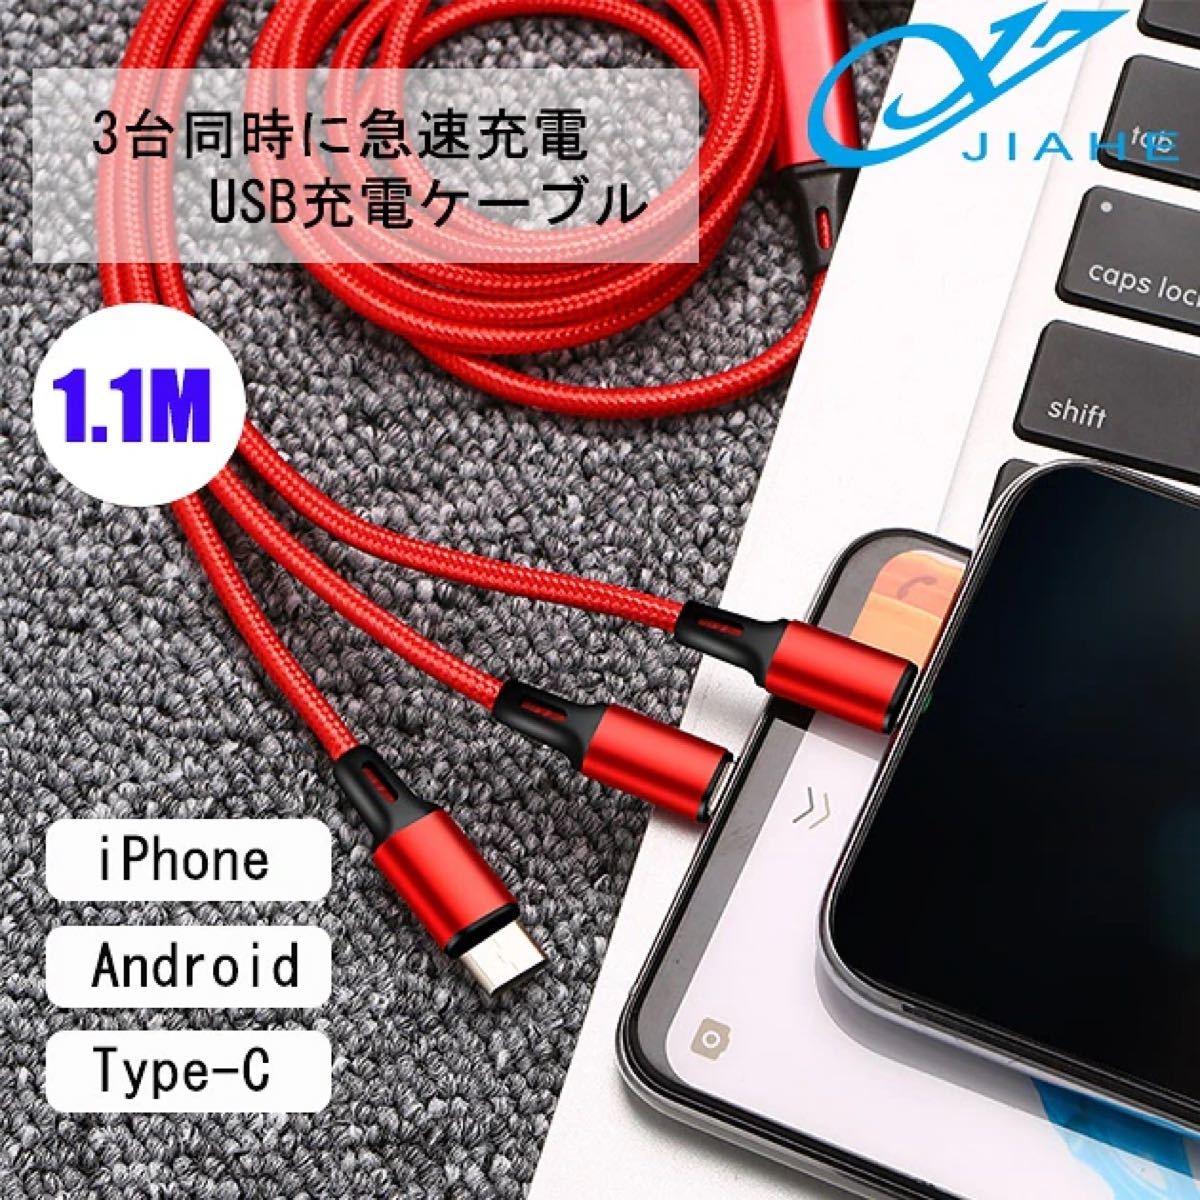 3in1充電ケーブル 2本セット ナイロン 断線防止 iPhone Micro Type-C モバイルバッテリー高耐久3台同時充電